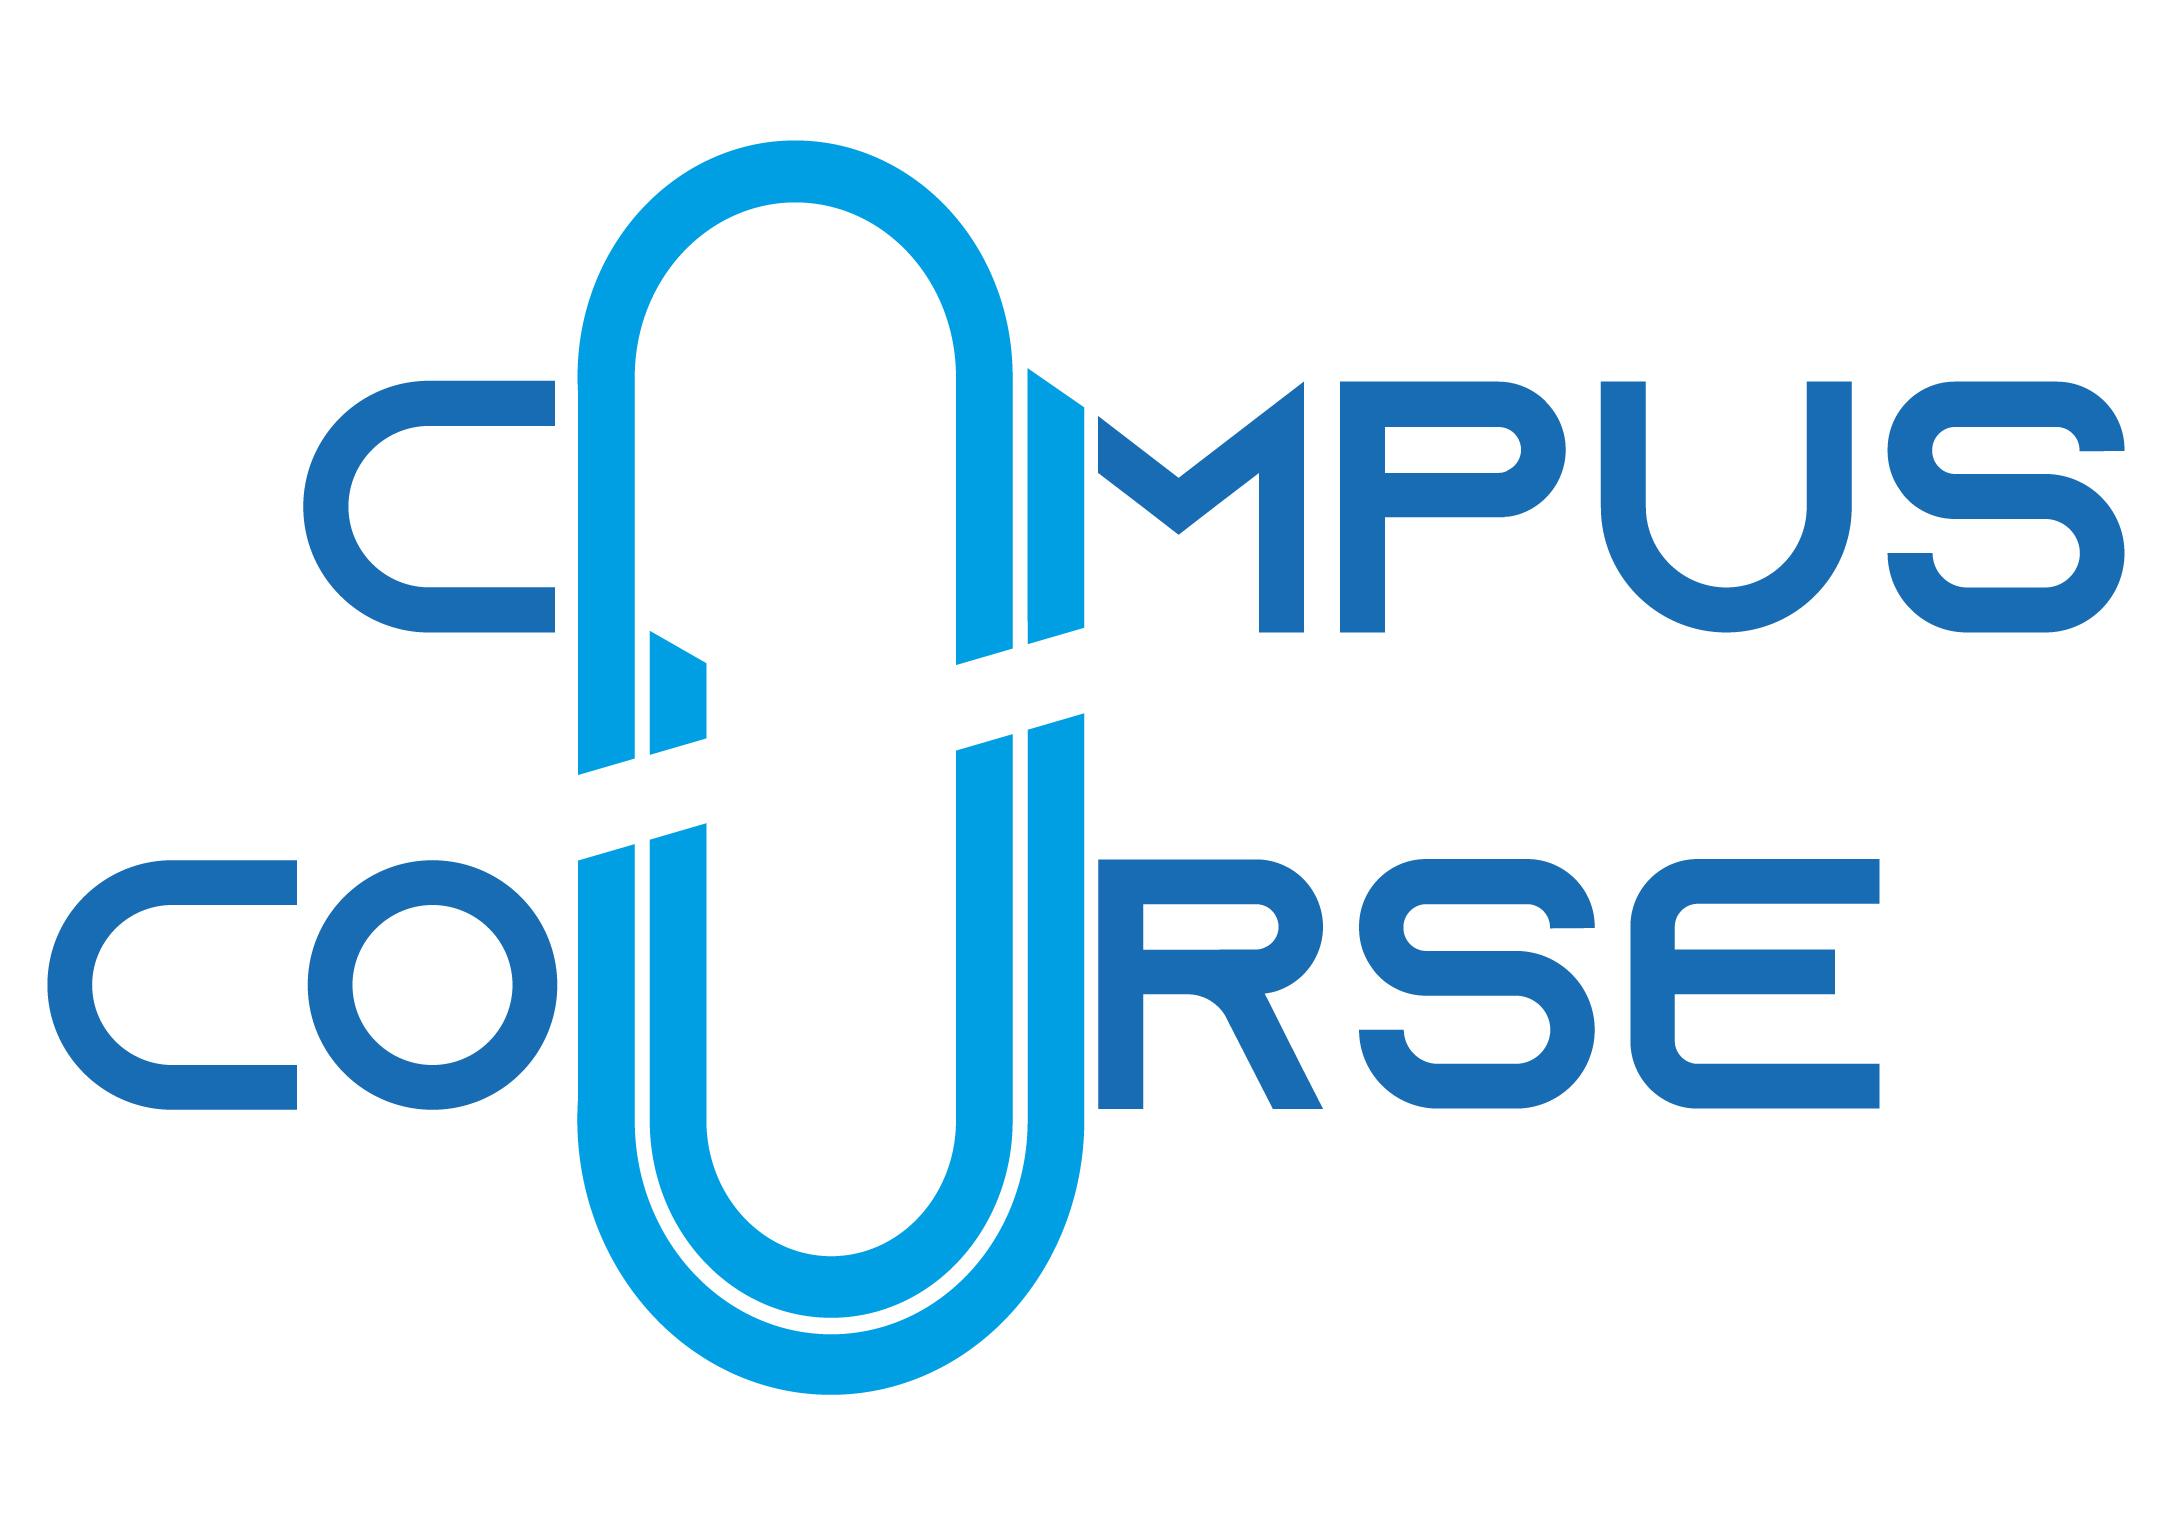 Campus Course